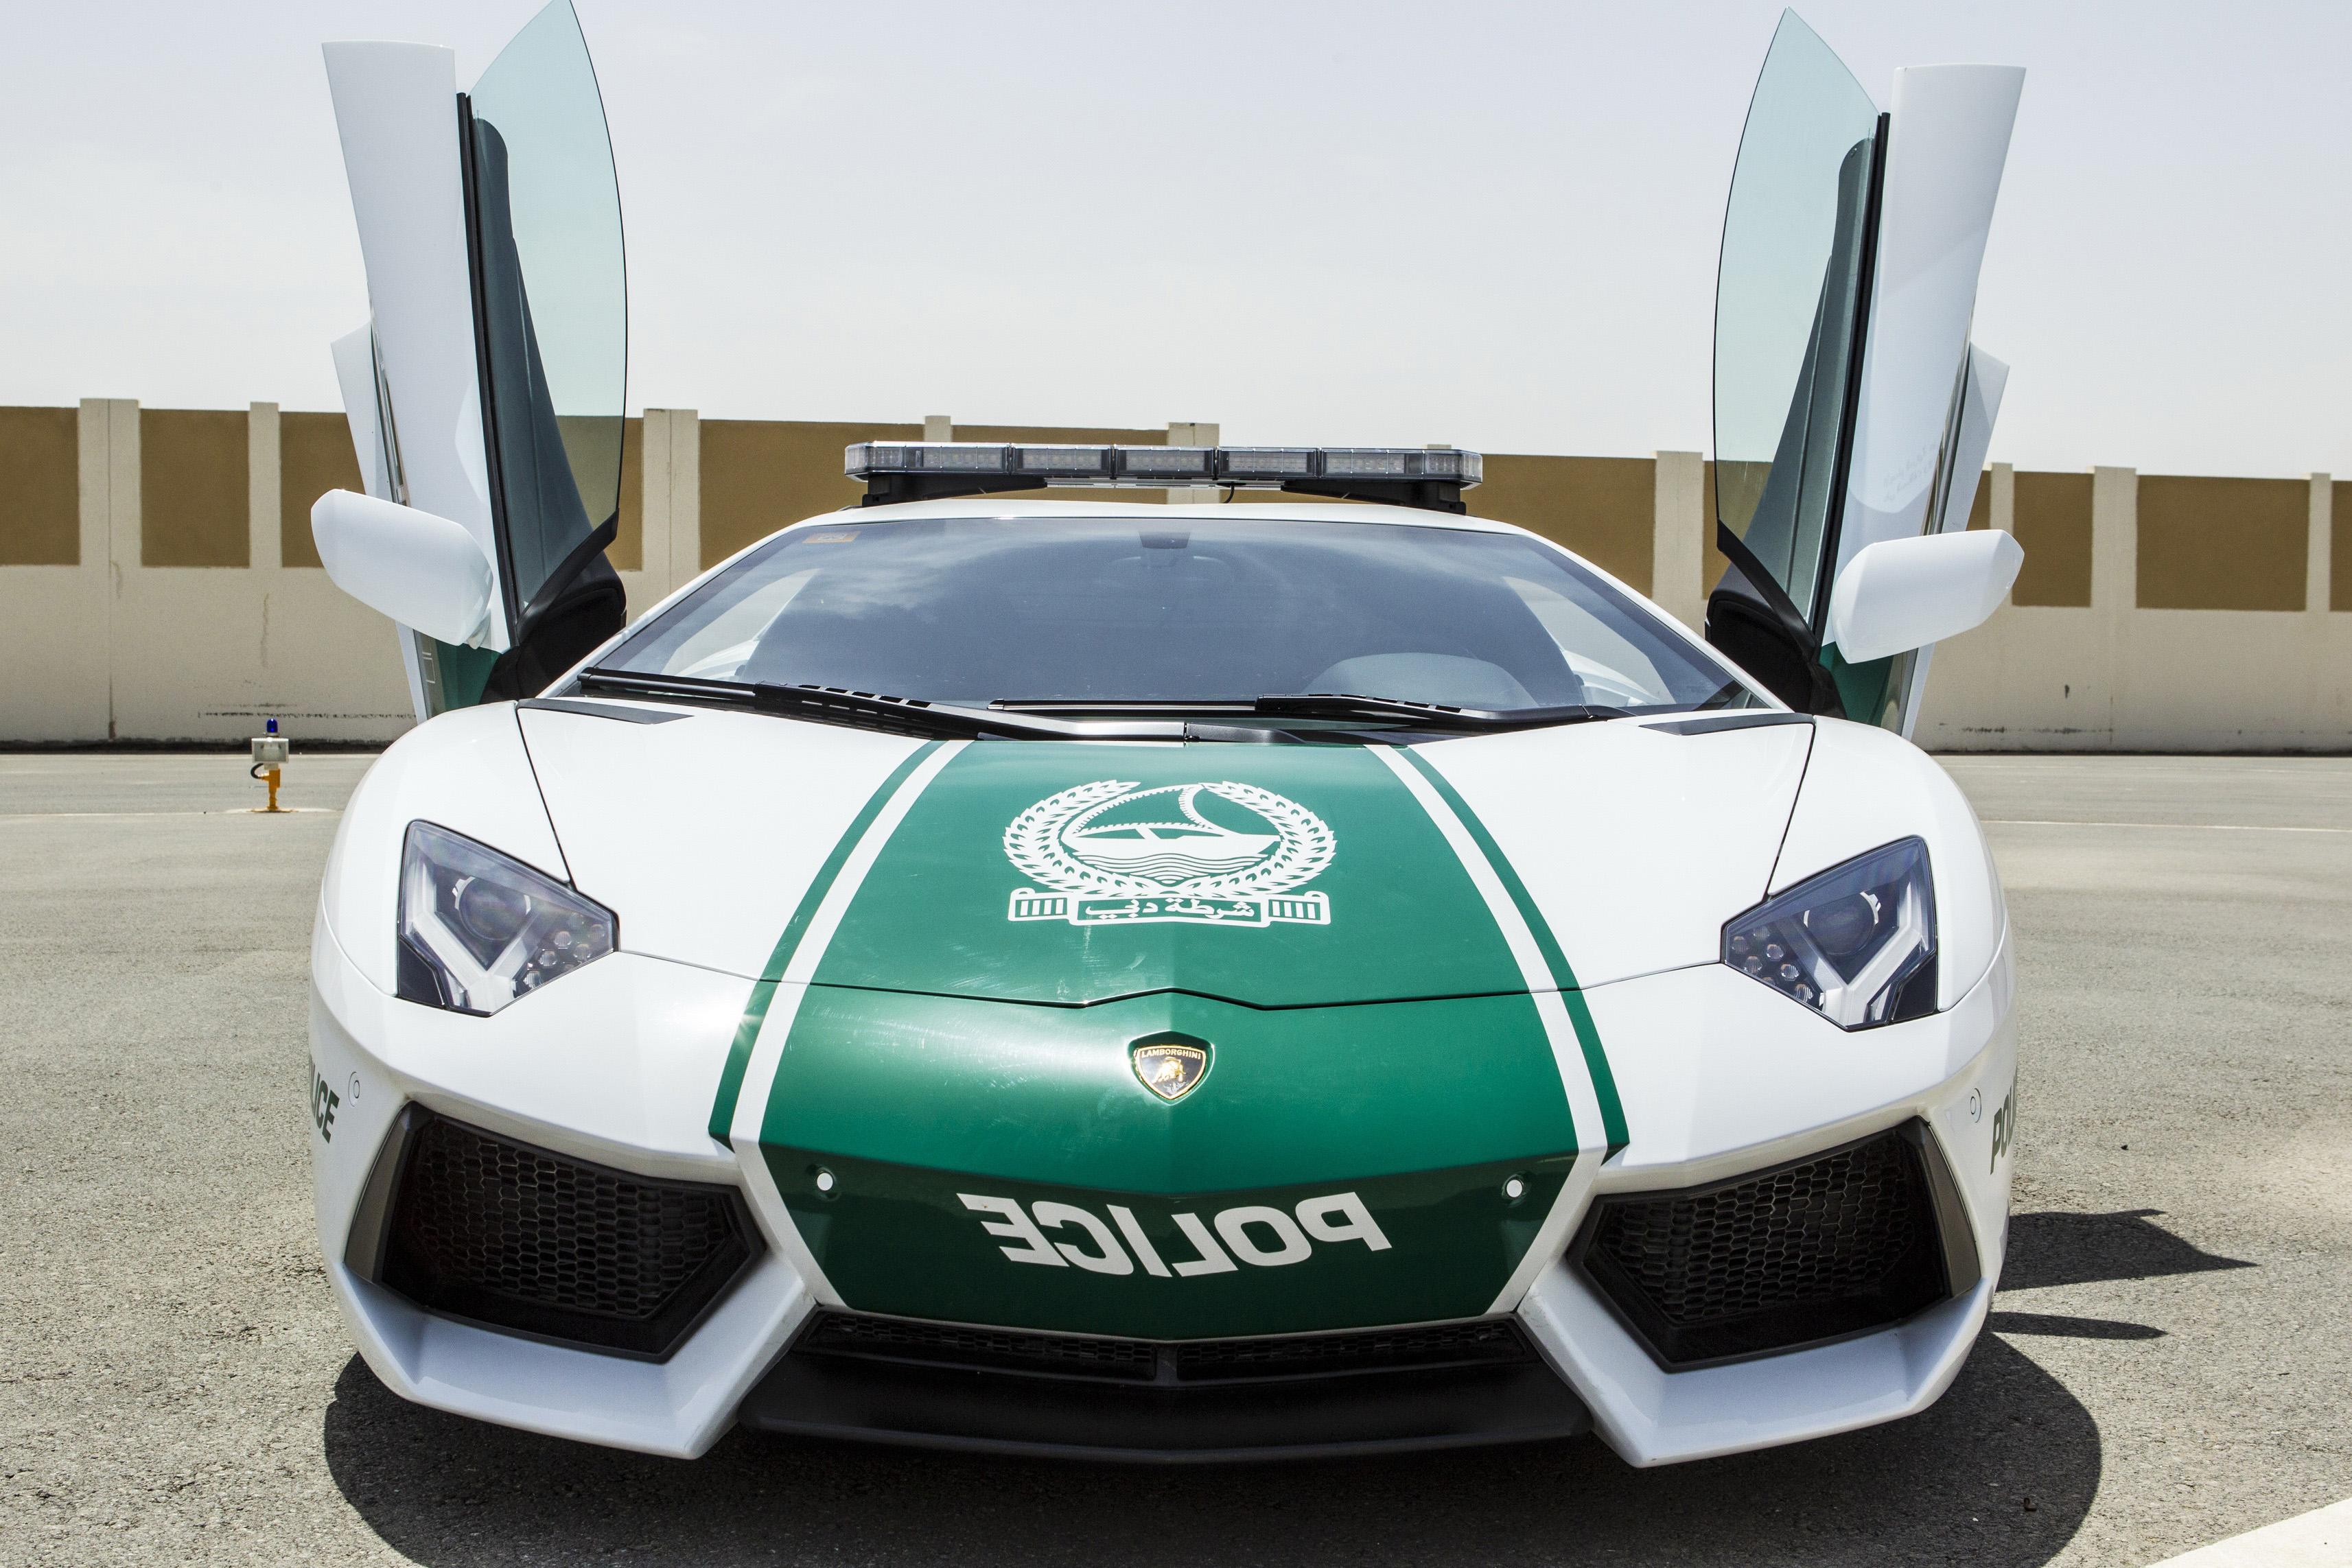 Lamborghini Police  C B Hd Wallpaper Background Image Id